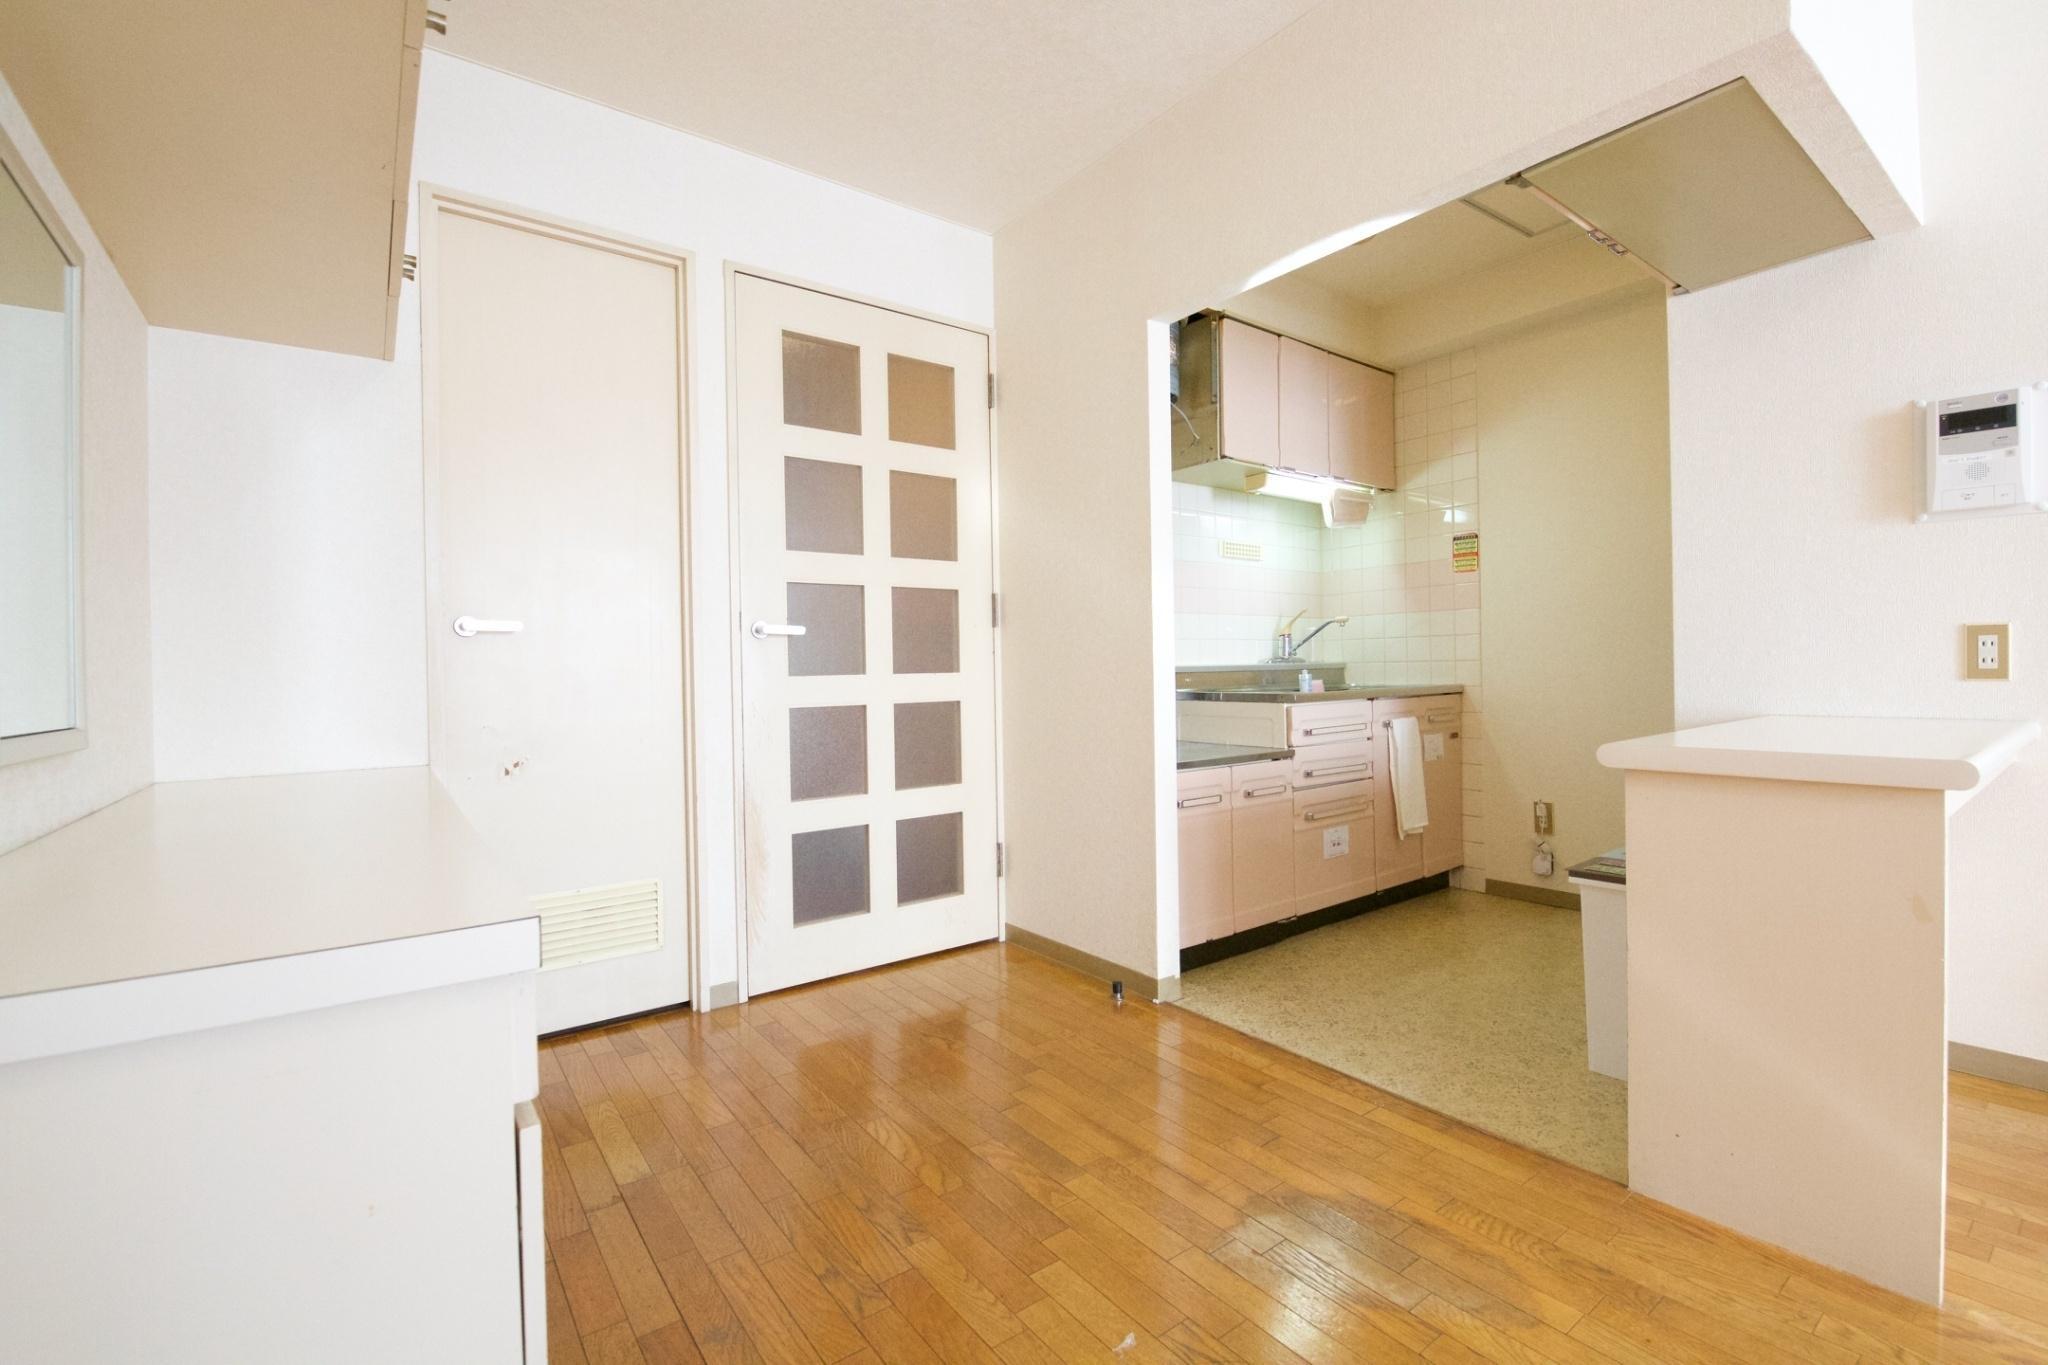 Hokaido Susukino Apartment 73